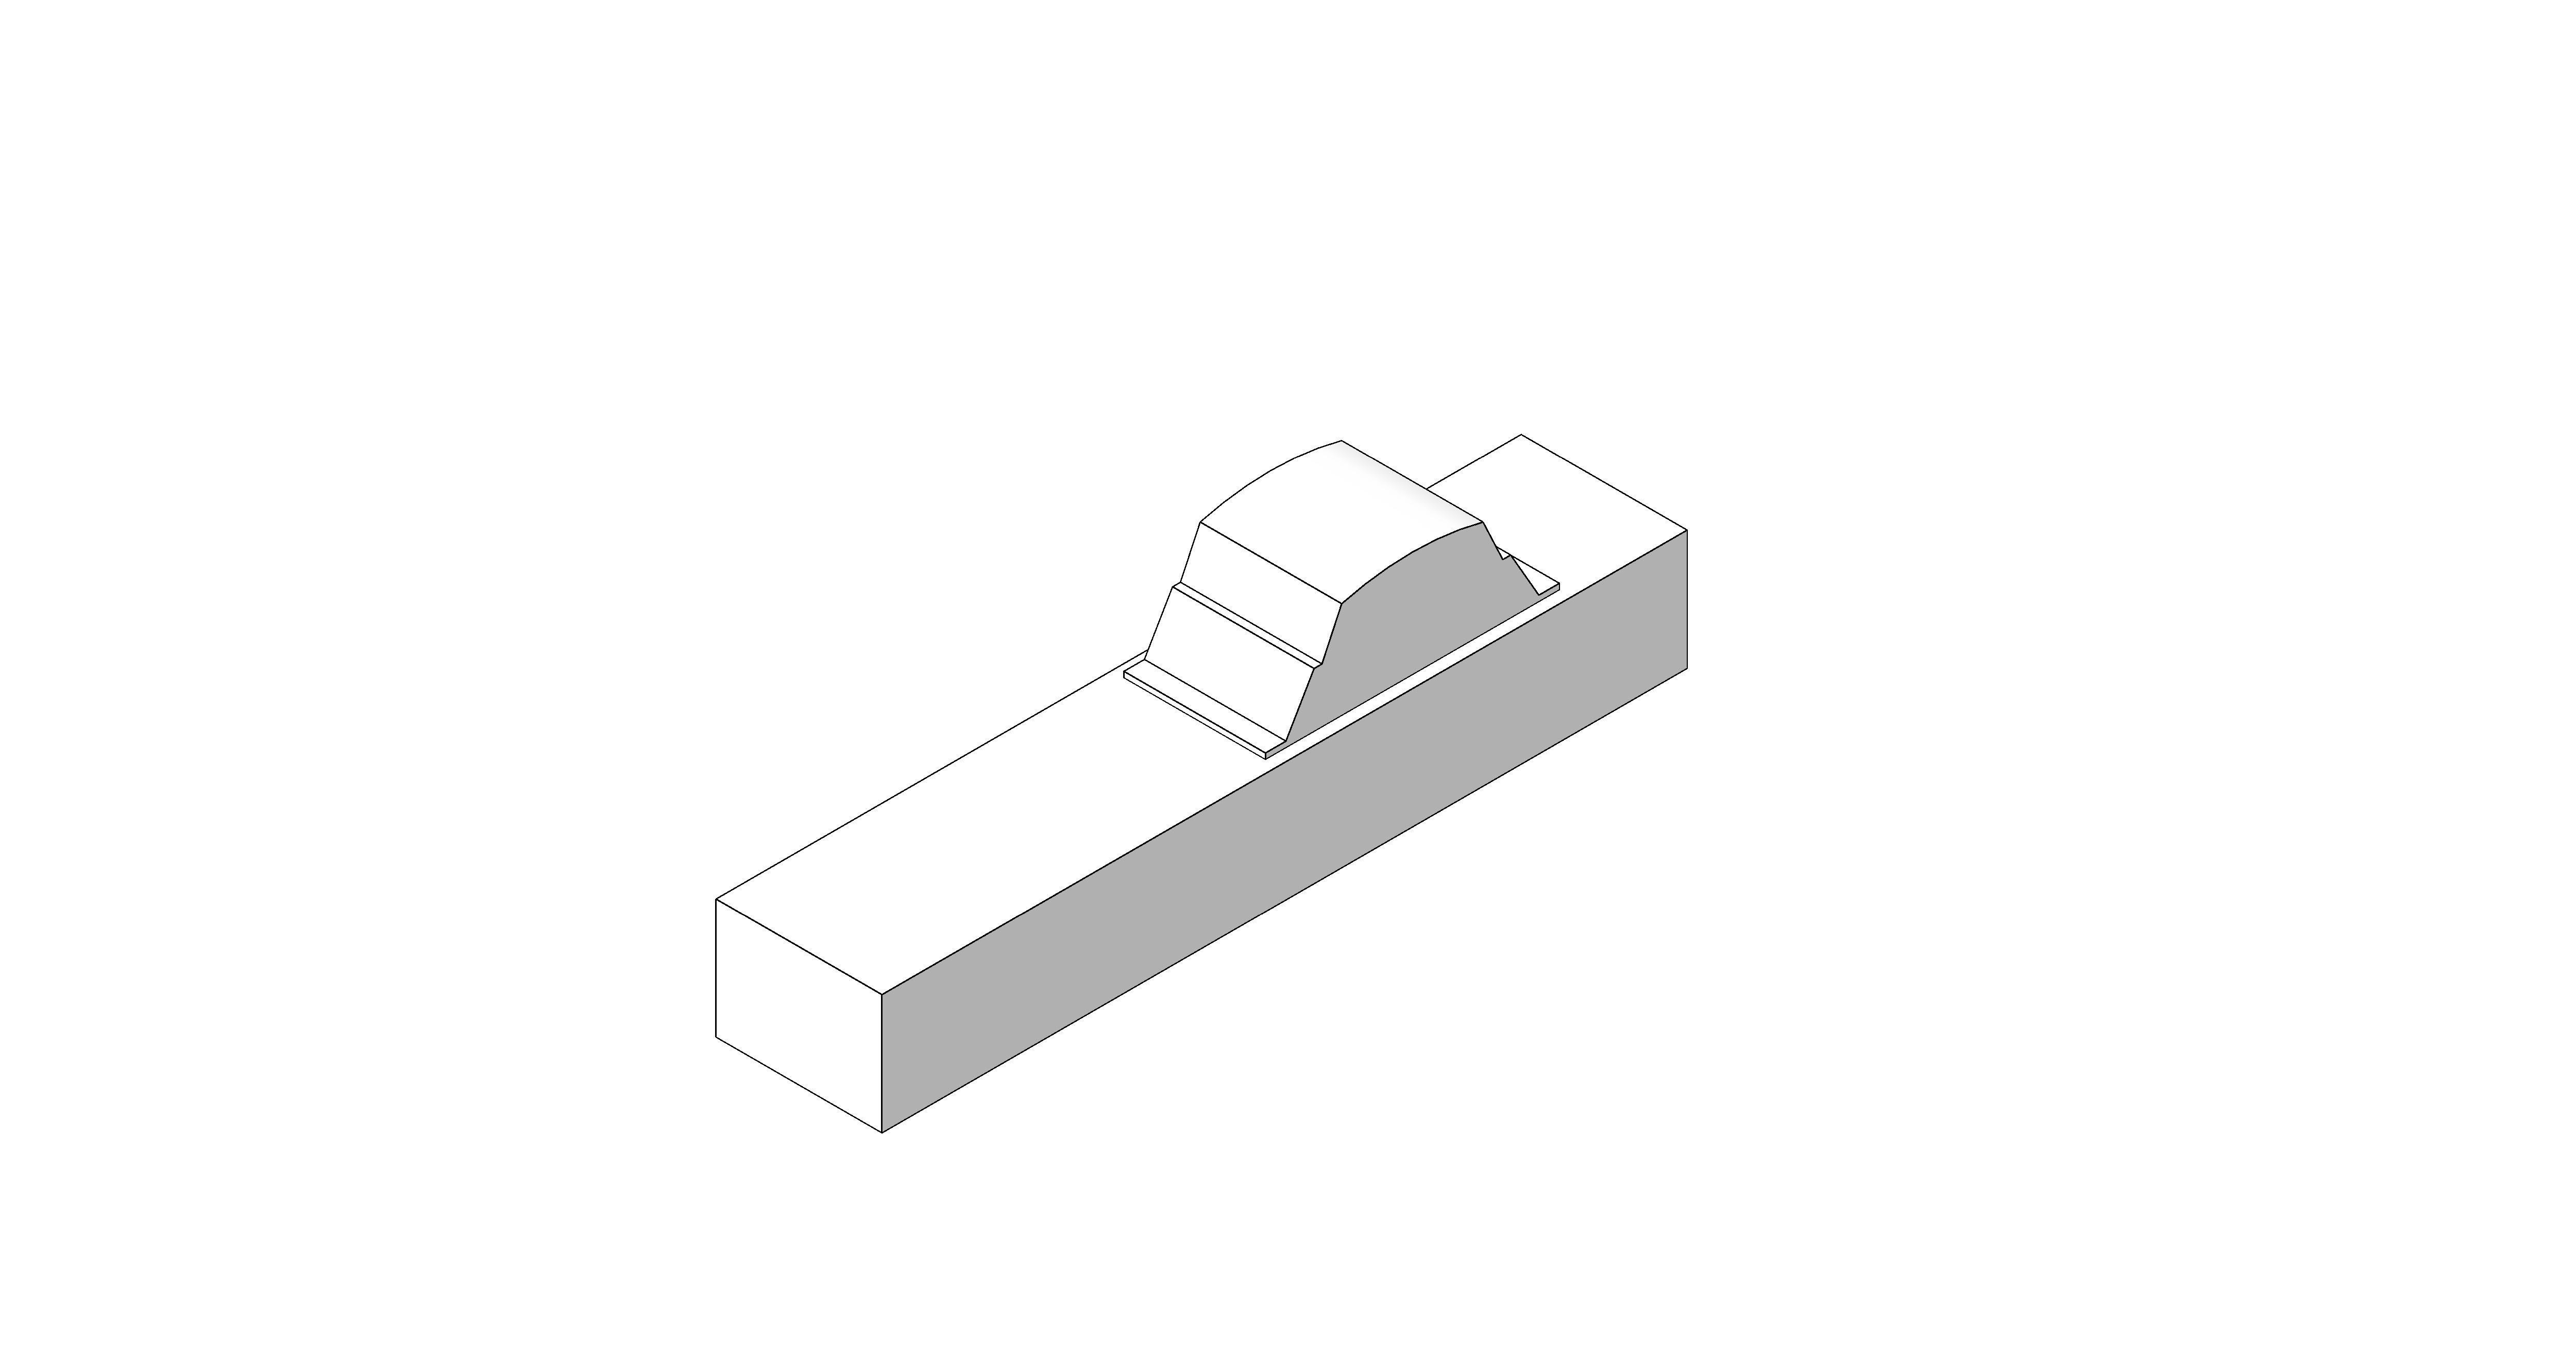 Product: Desk Module - 1 Way RCBO